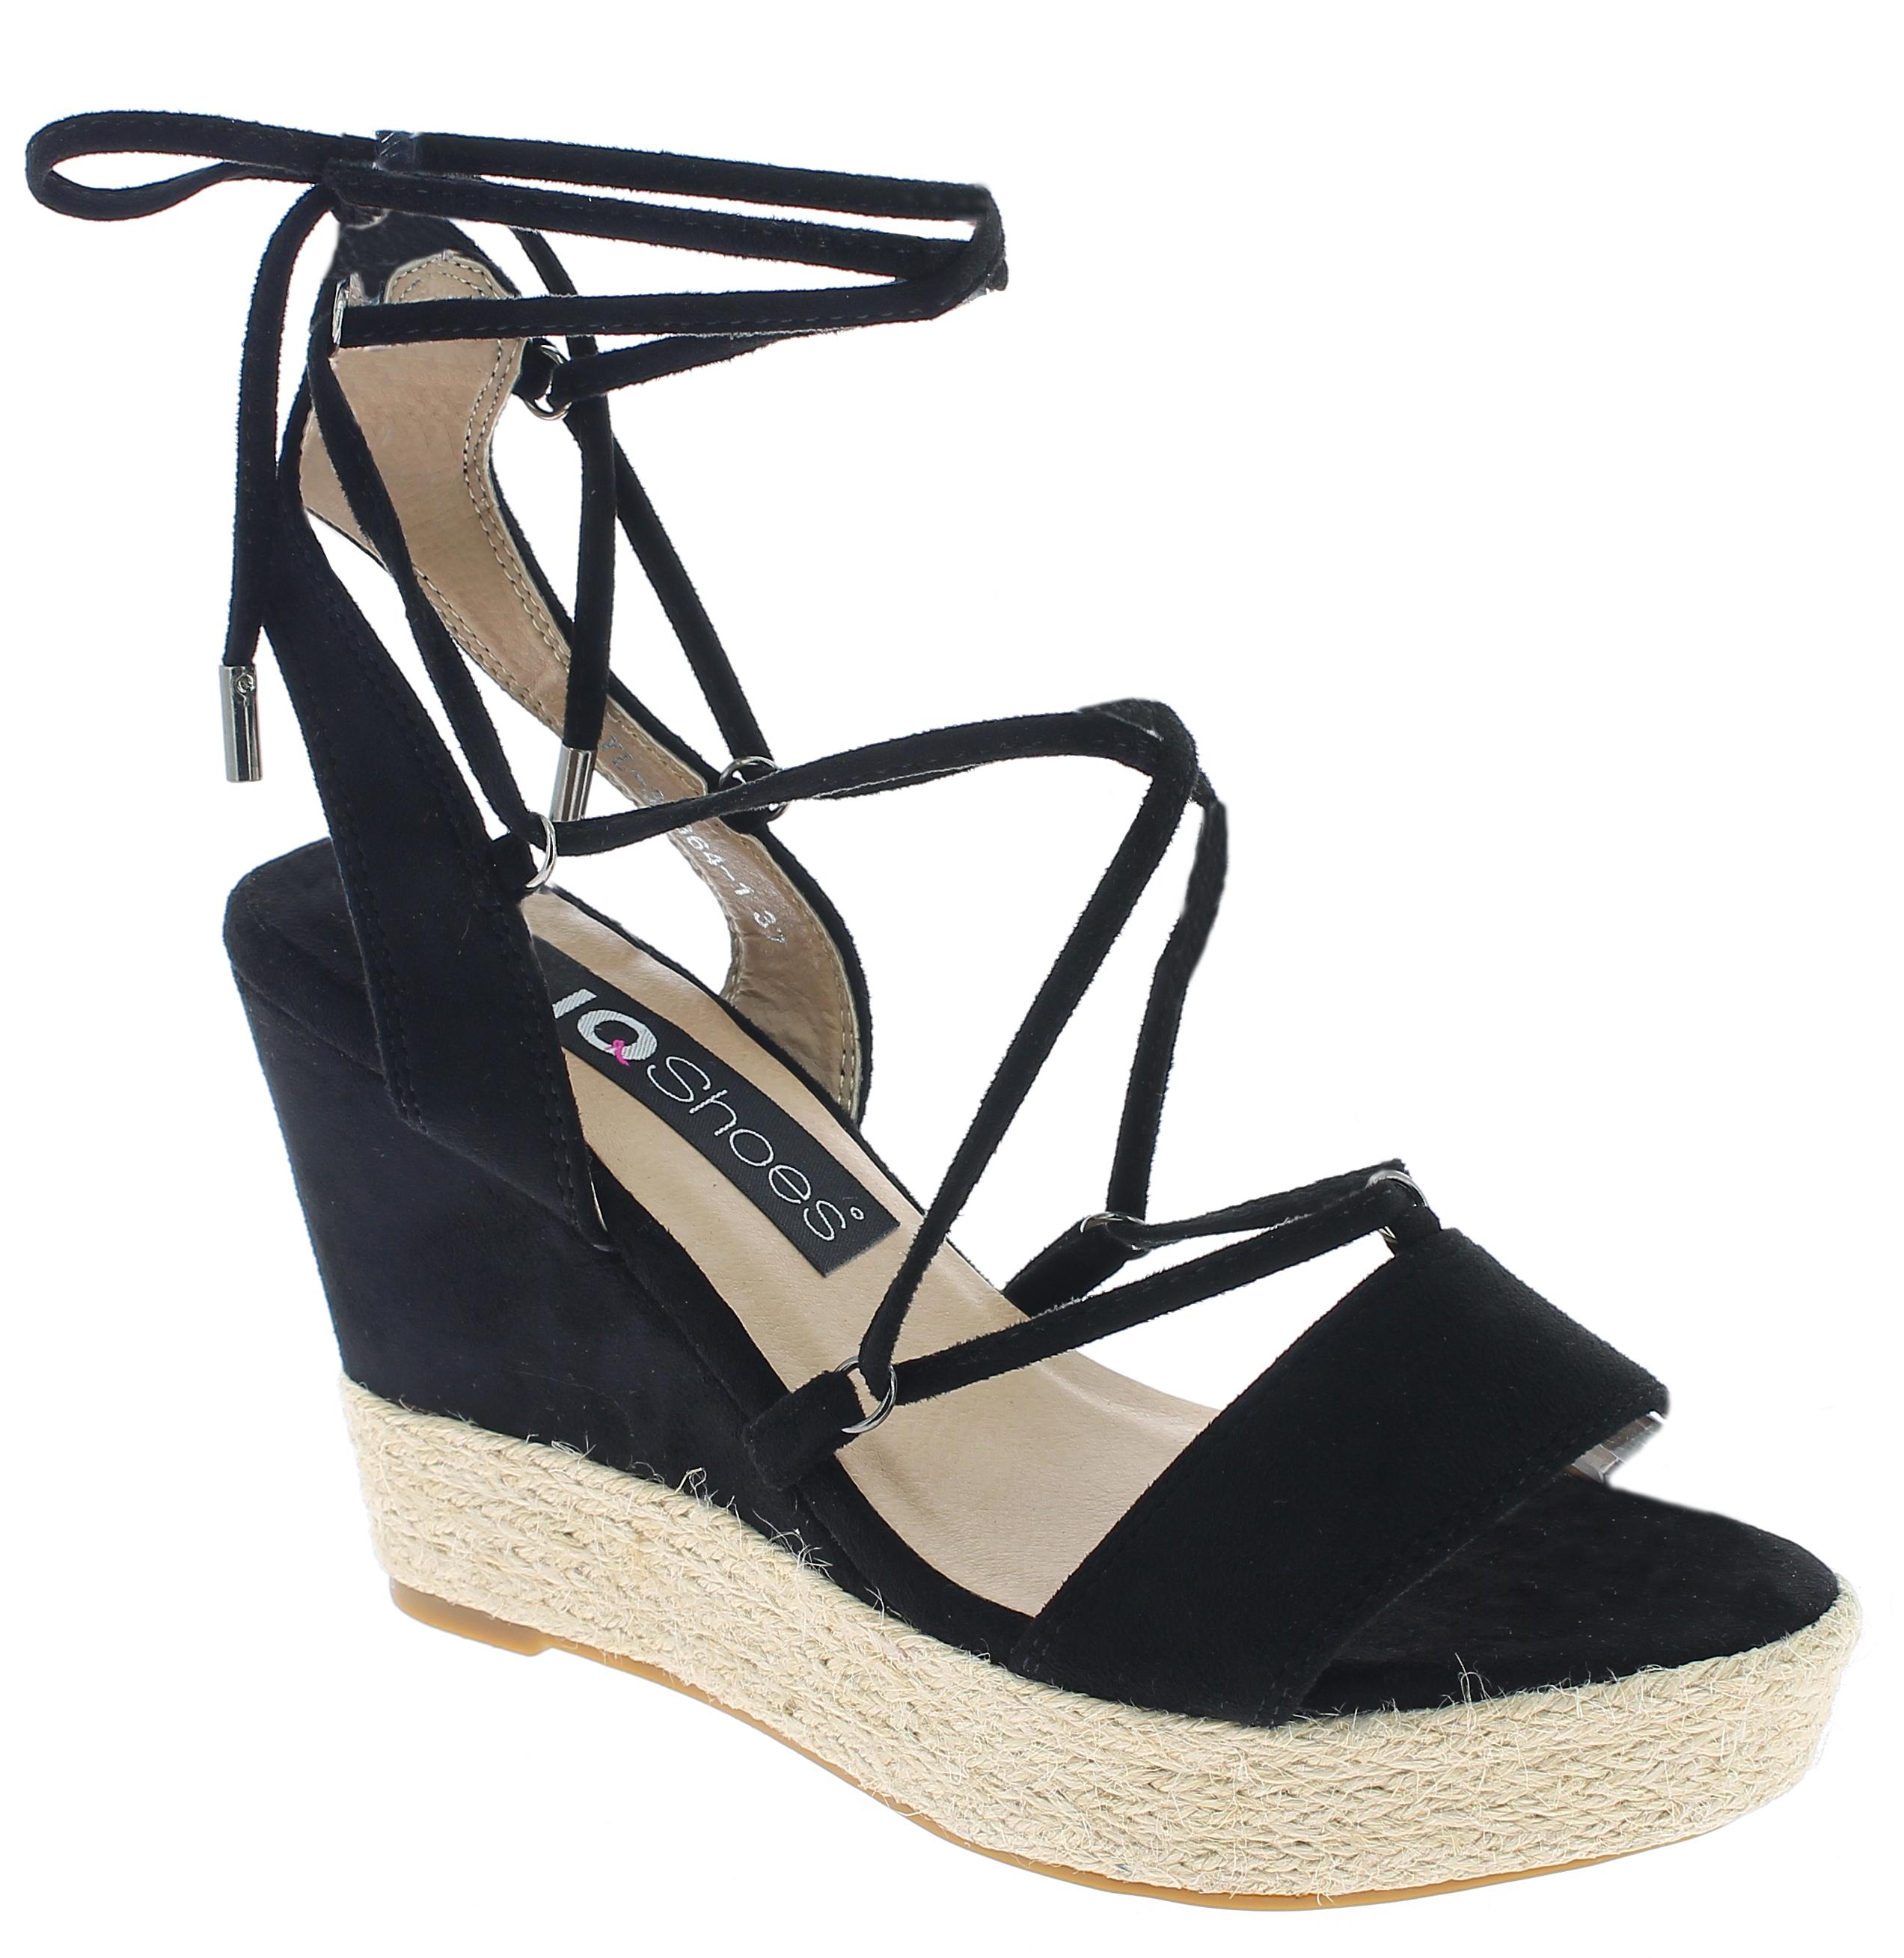 IQSHOES Γυναικεία Πλατφόρμα 3A364 Μαύρο - IqShoes - 3A364 BLACK-black-39/1/15/25 παπούτσια  πέδιλα